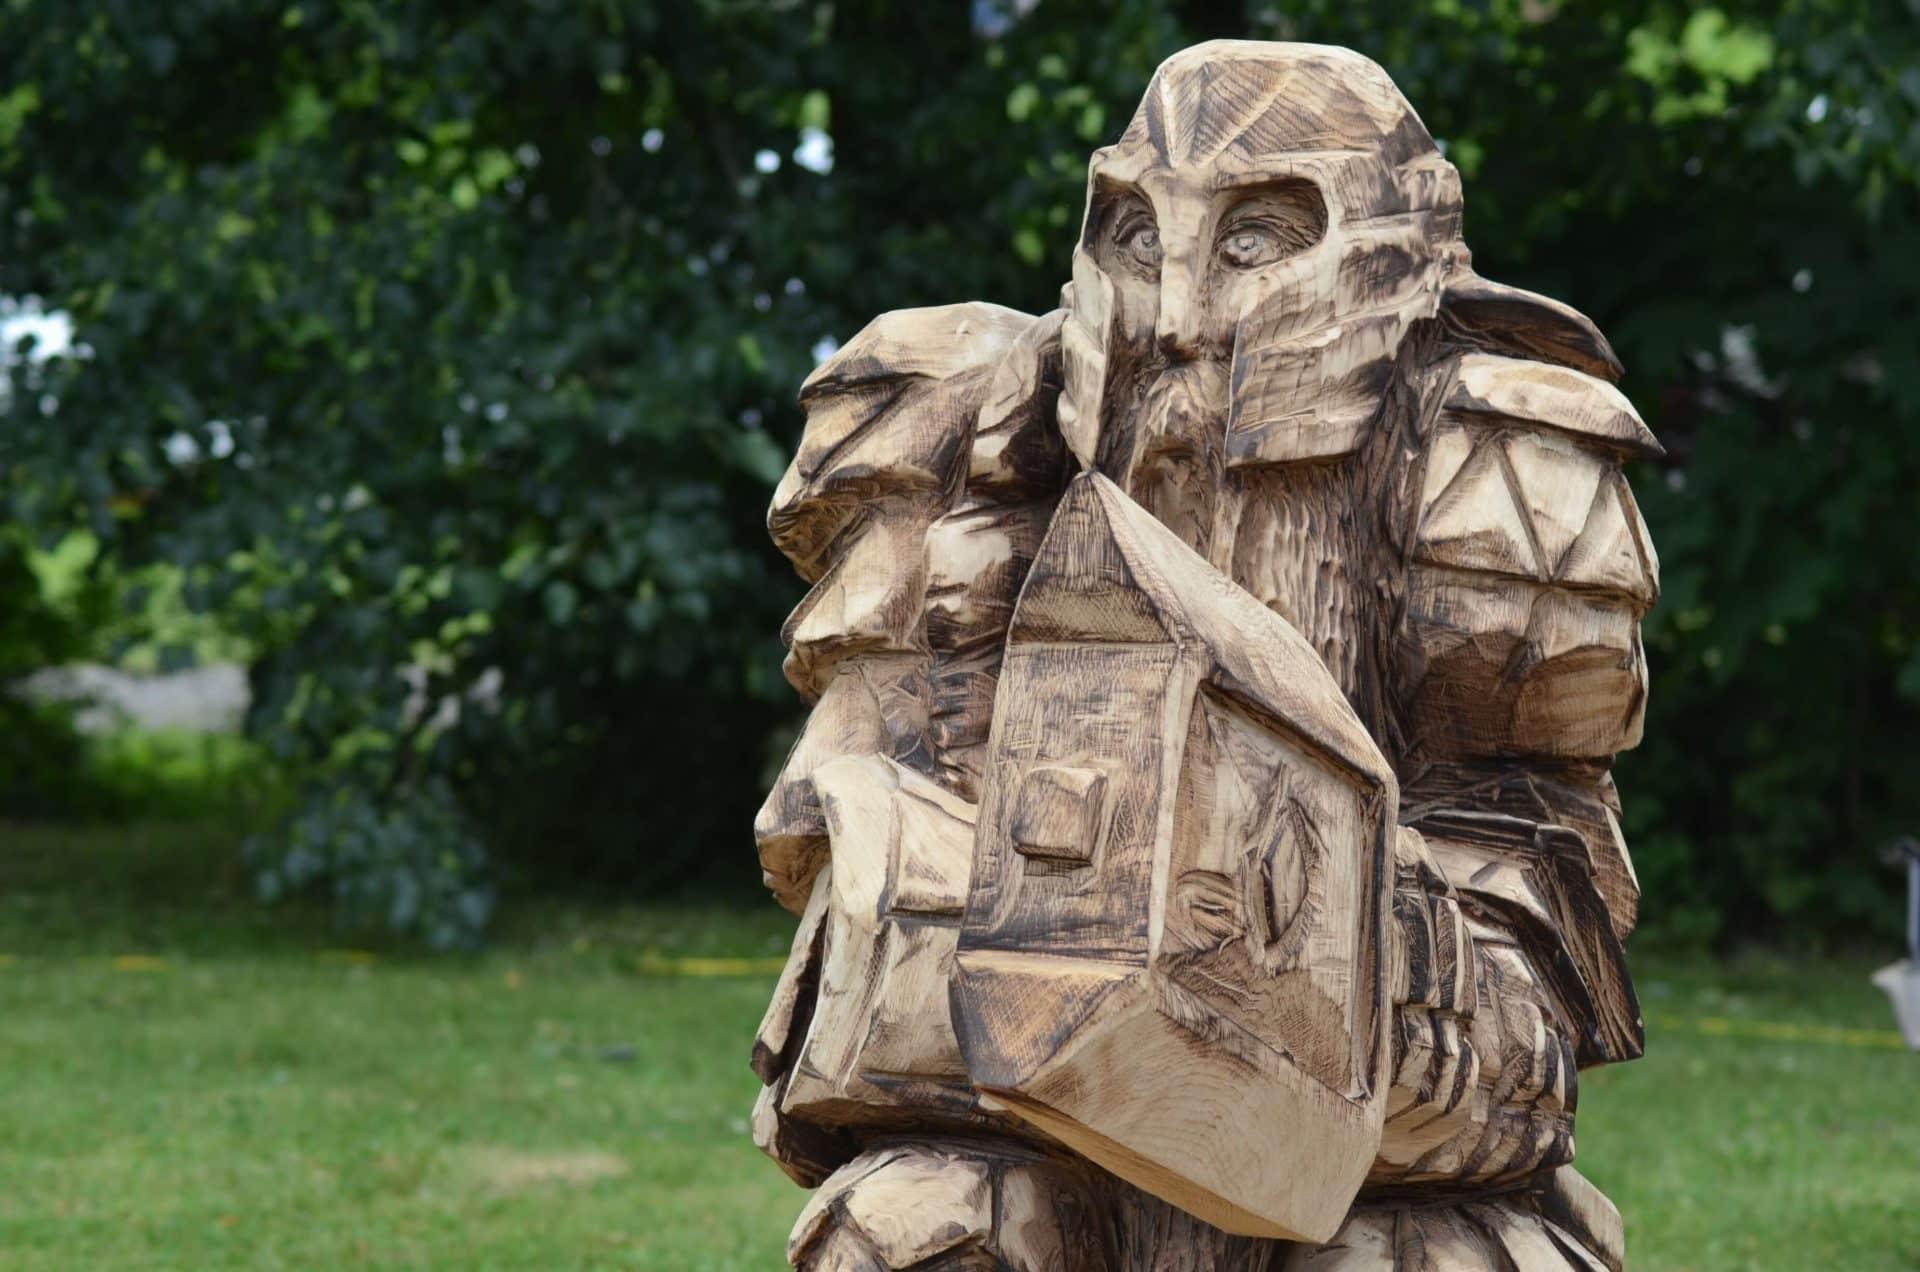 holz-figur-carving-cup-gartendeko